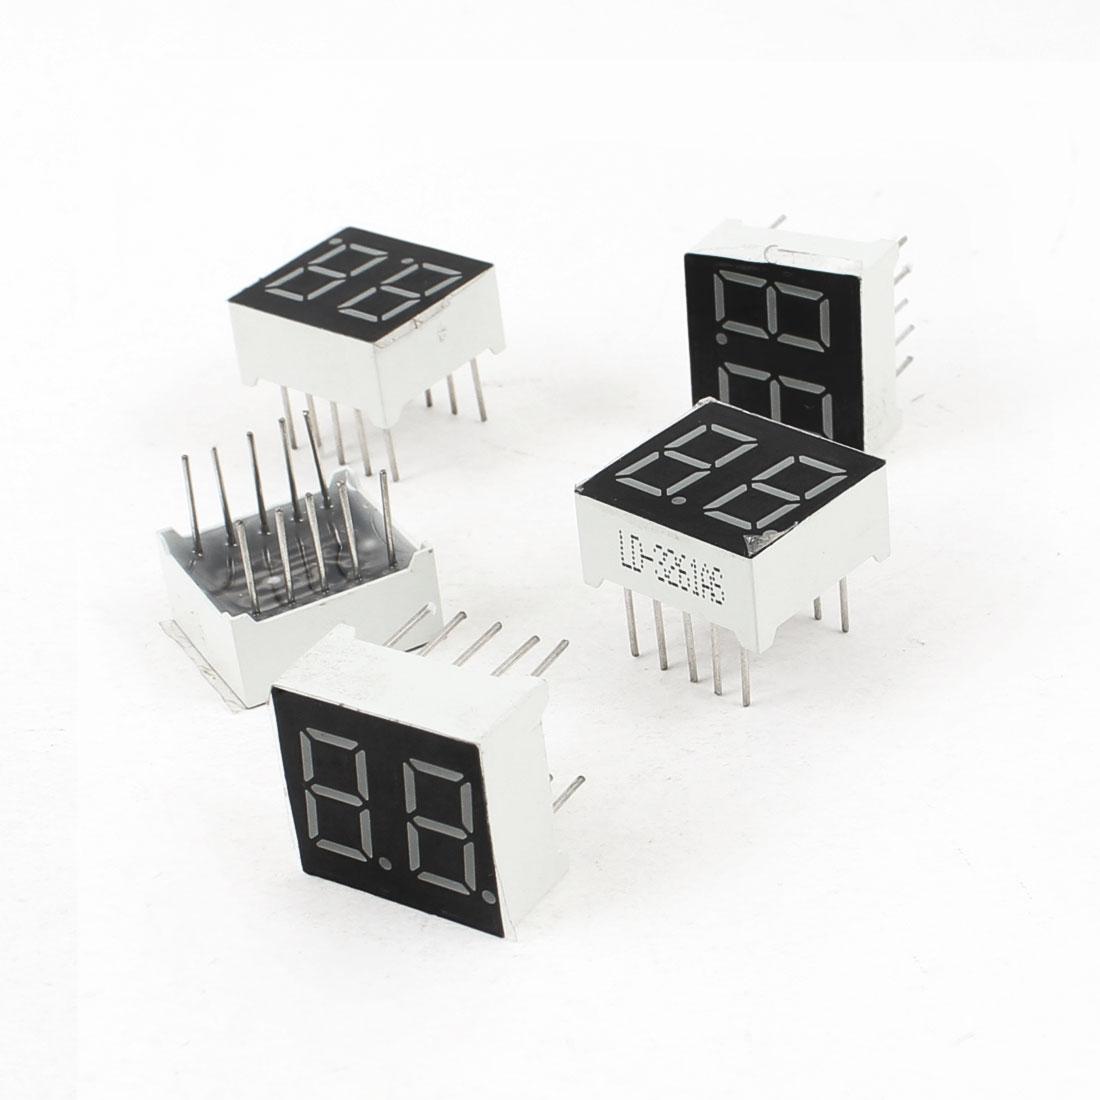 "5 Pcs Common Cathode 10 Pin 2 Bit 7 Segment 0.36"" Red LED Display Digital Tube"